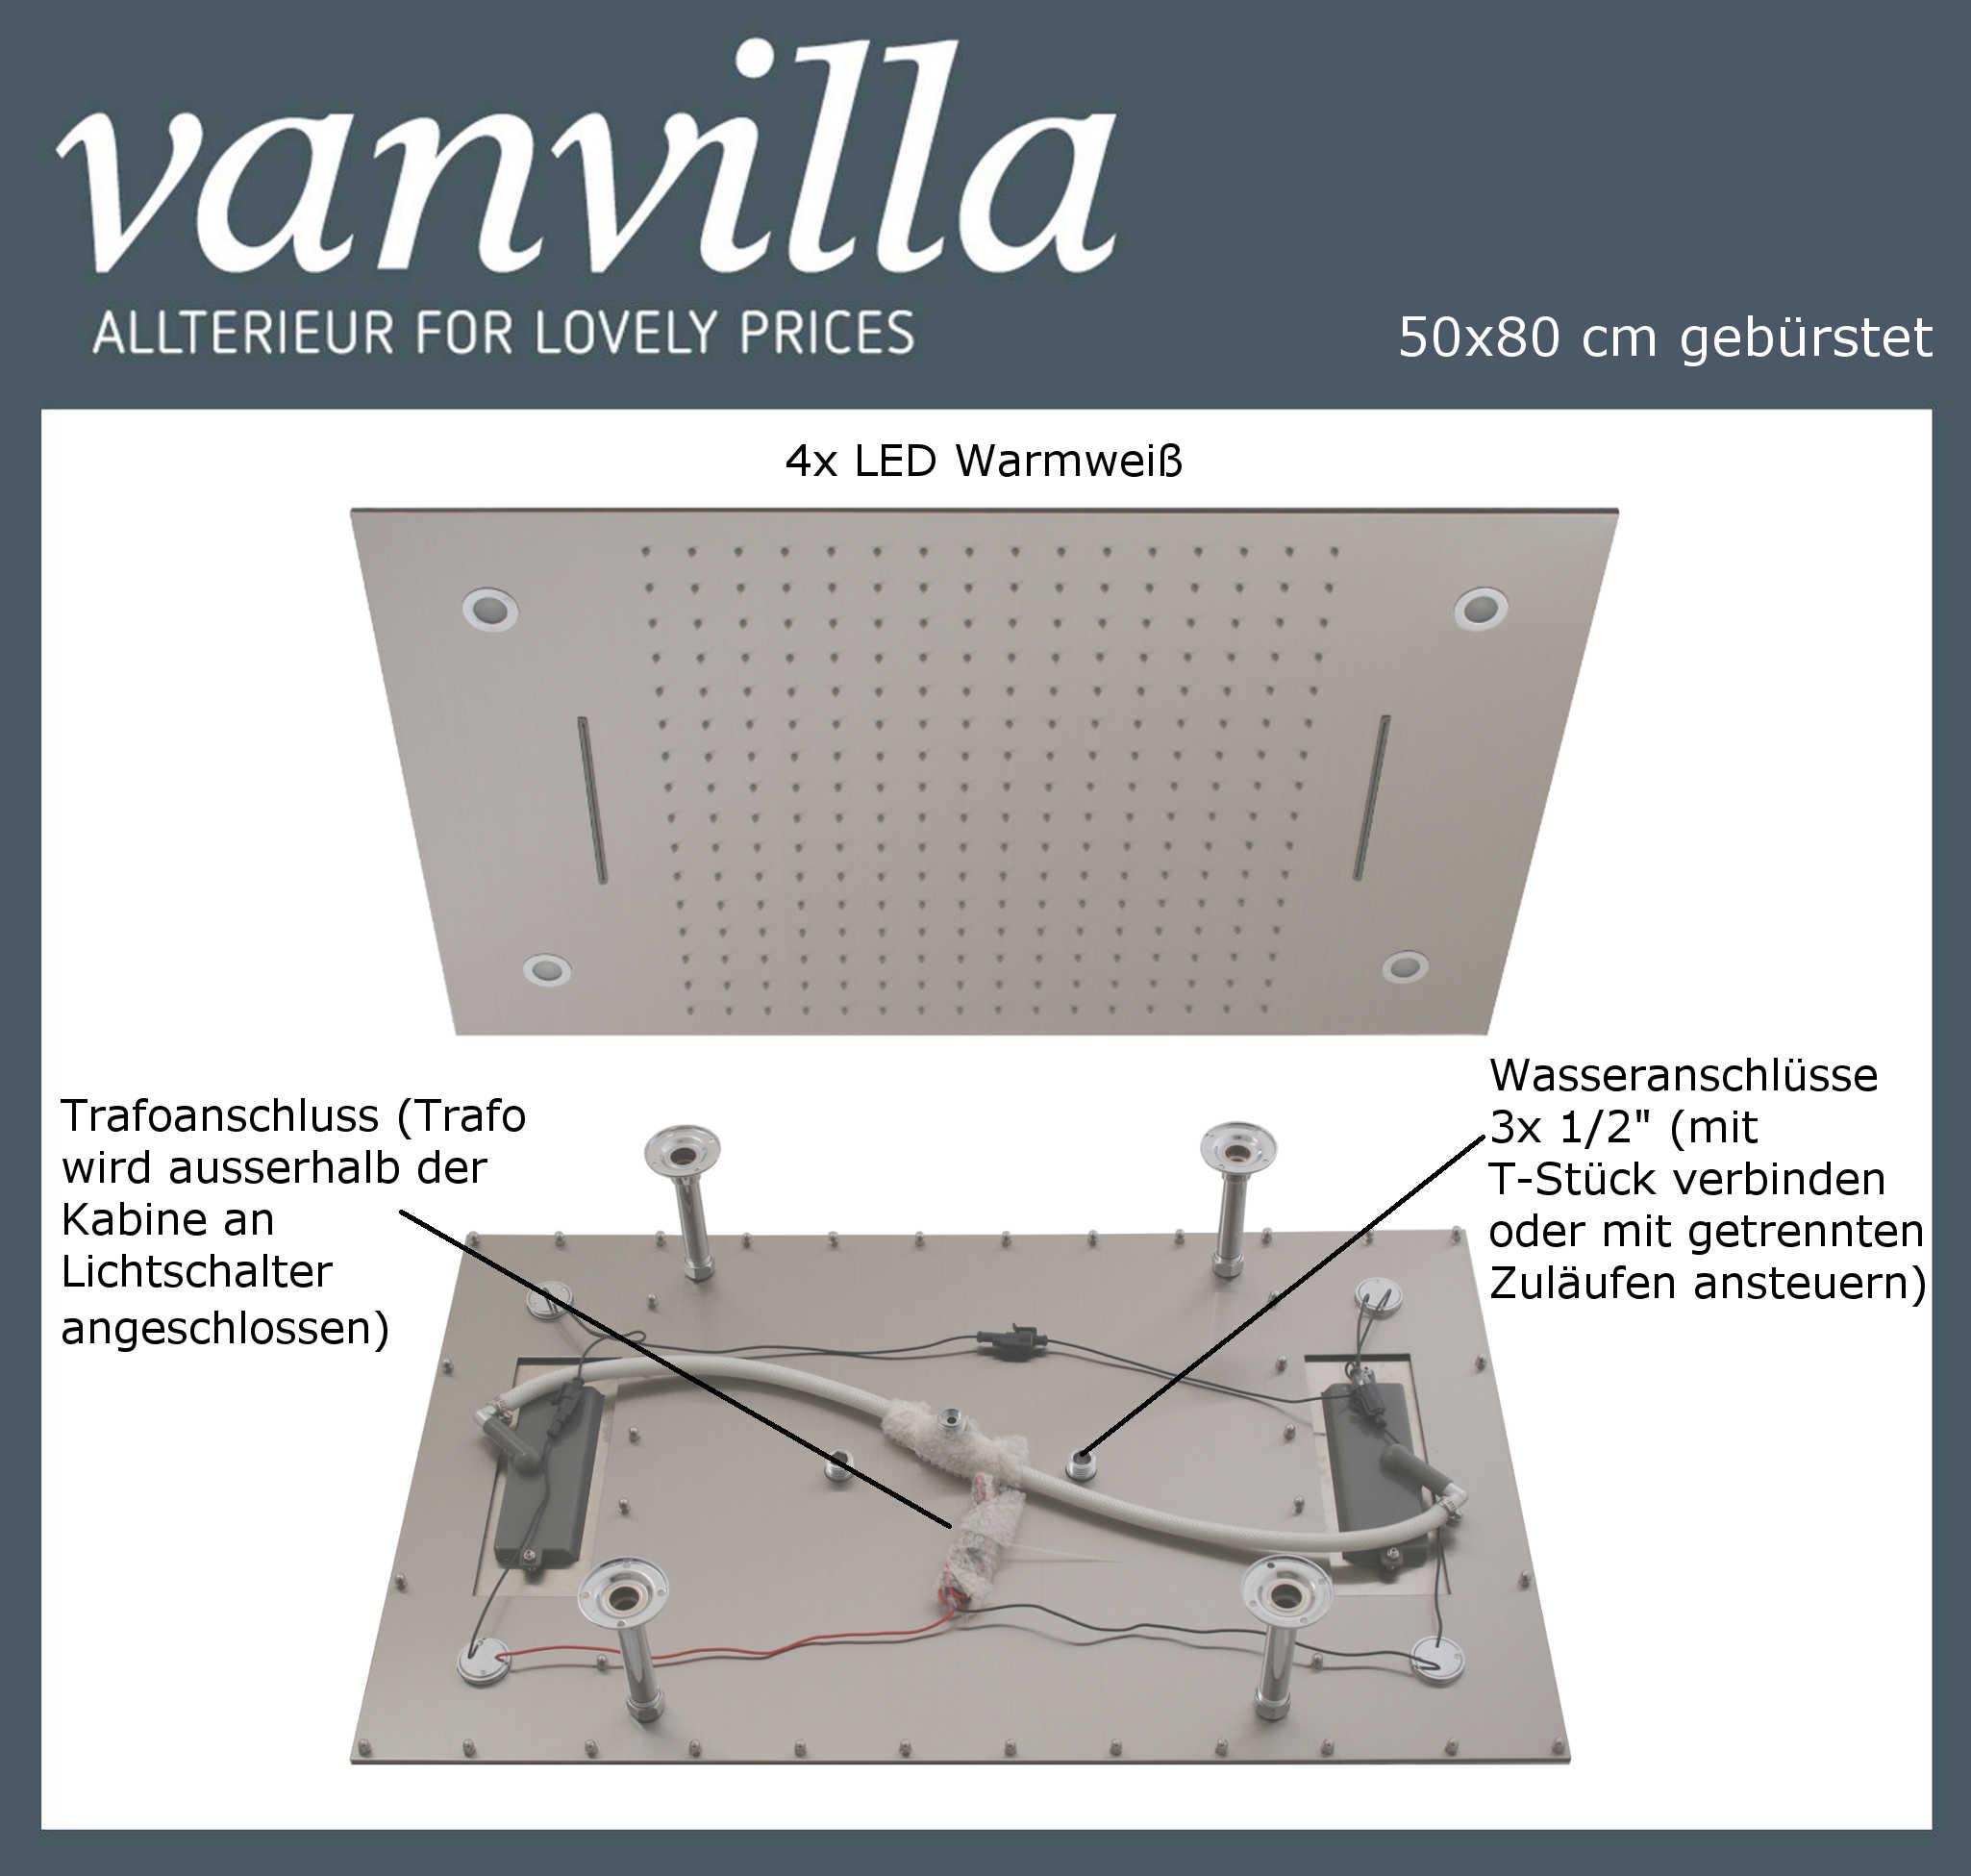 Duschkopf vanvilla LED 50cm x 80cm gebürstet 115080W-B LED